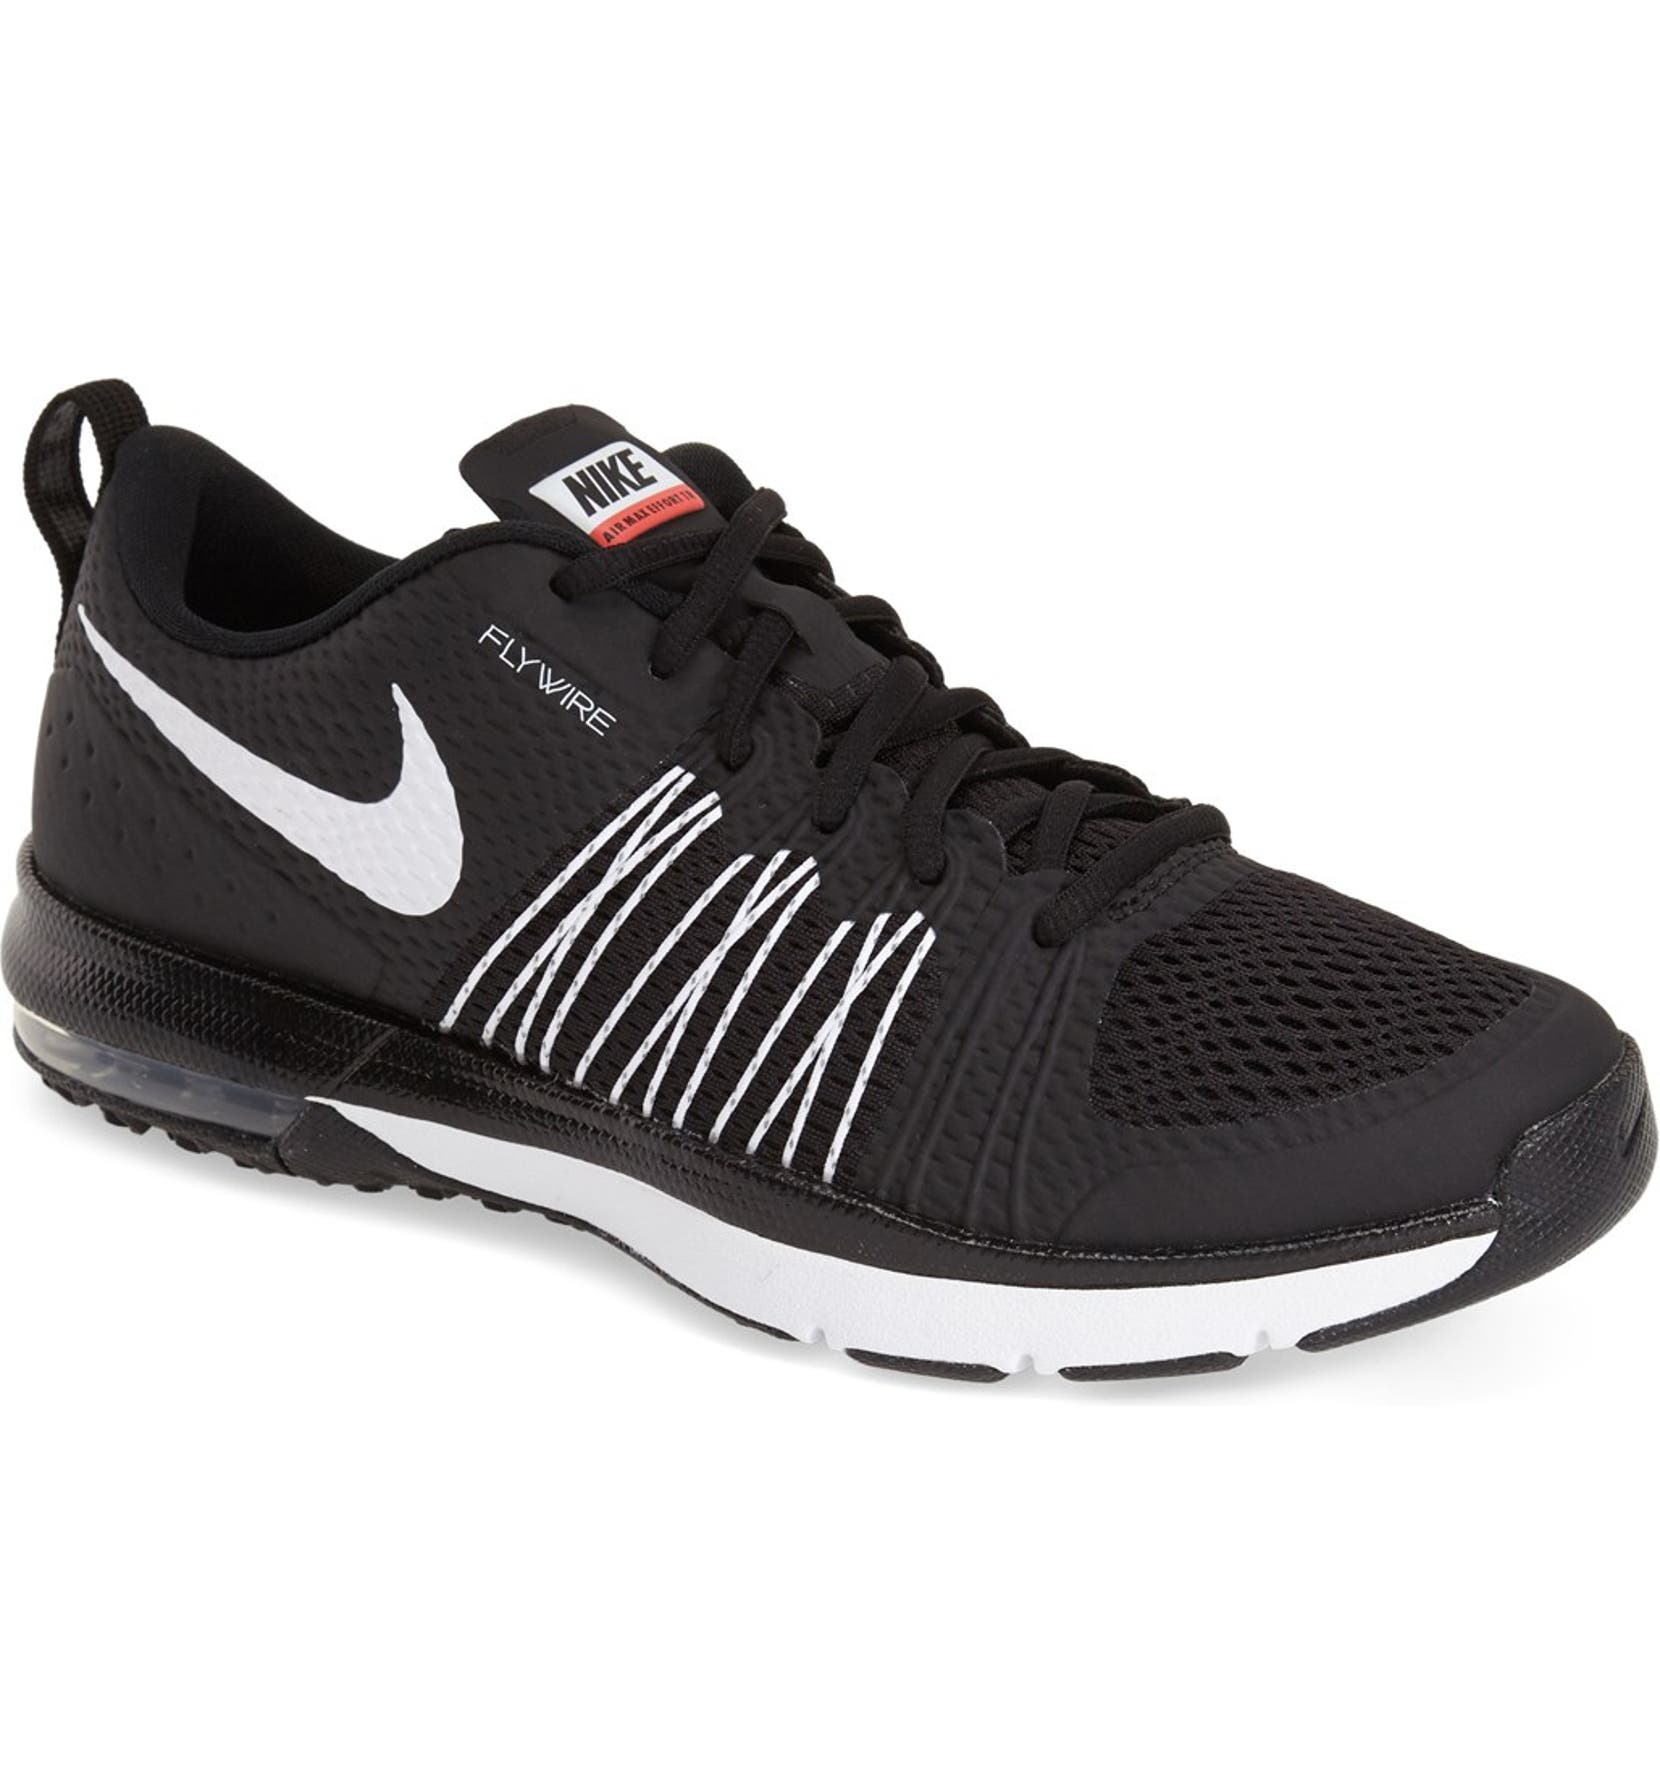 on sale 57743 6f587 Nike  Air Max Effort TR  Training Shoe (Men)   Nordstrom